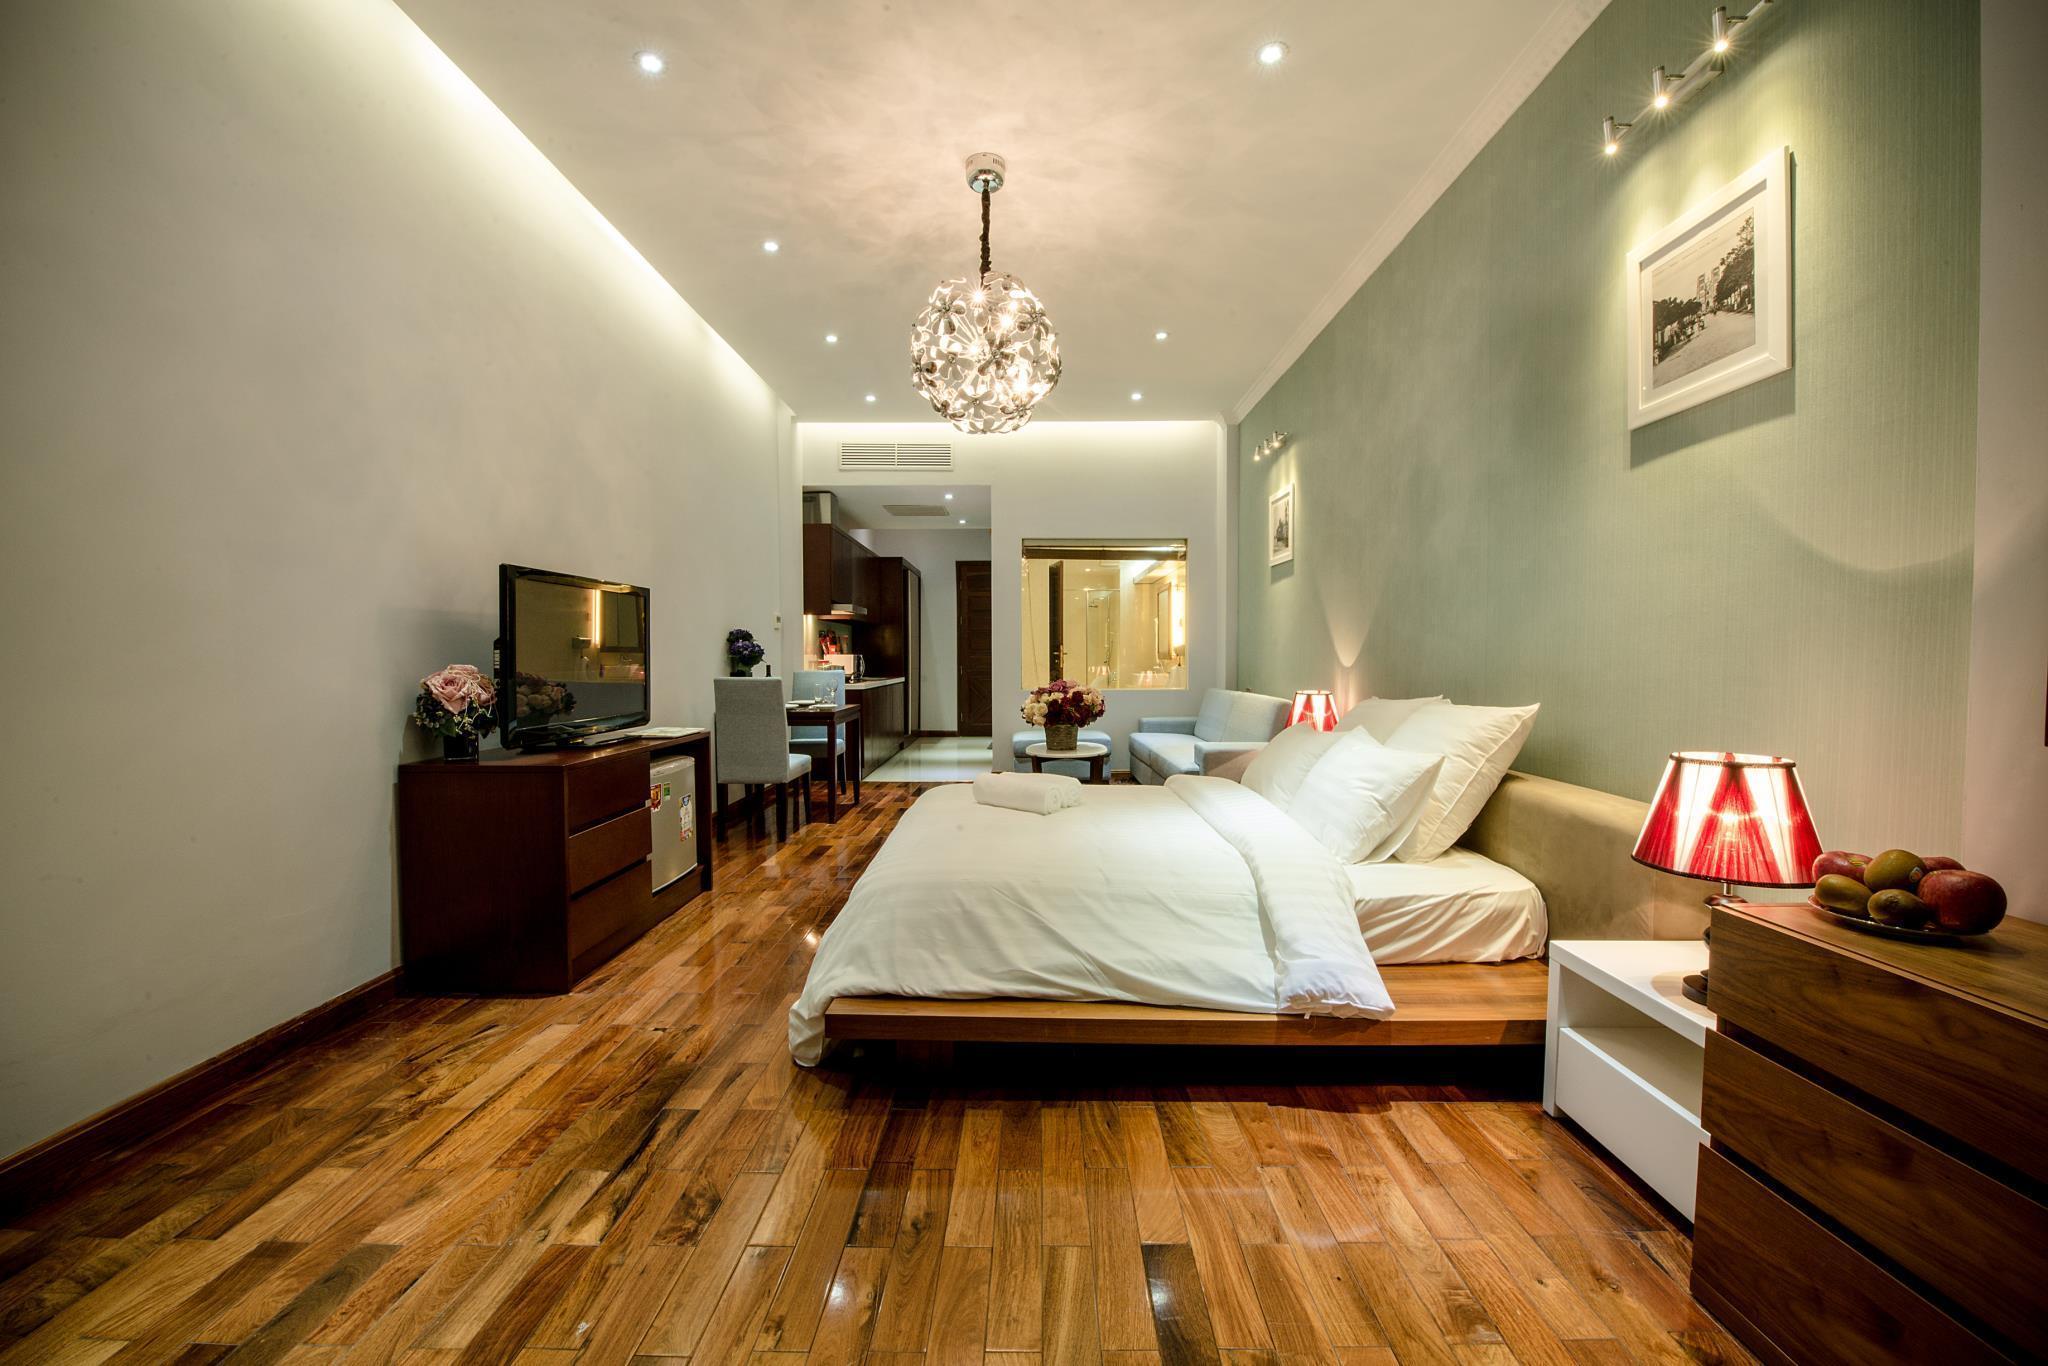 New Gate Apartment, Ba Đình